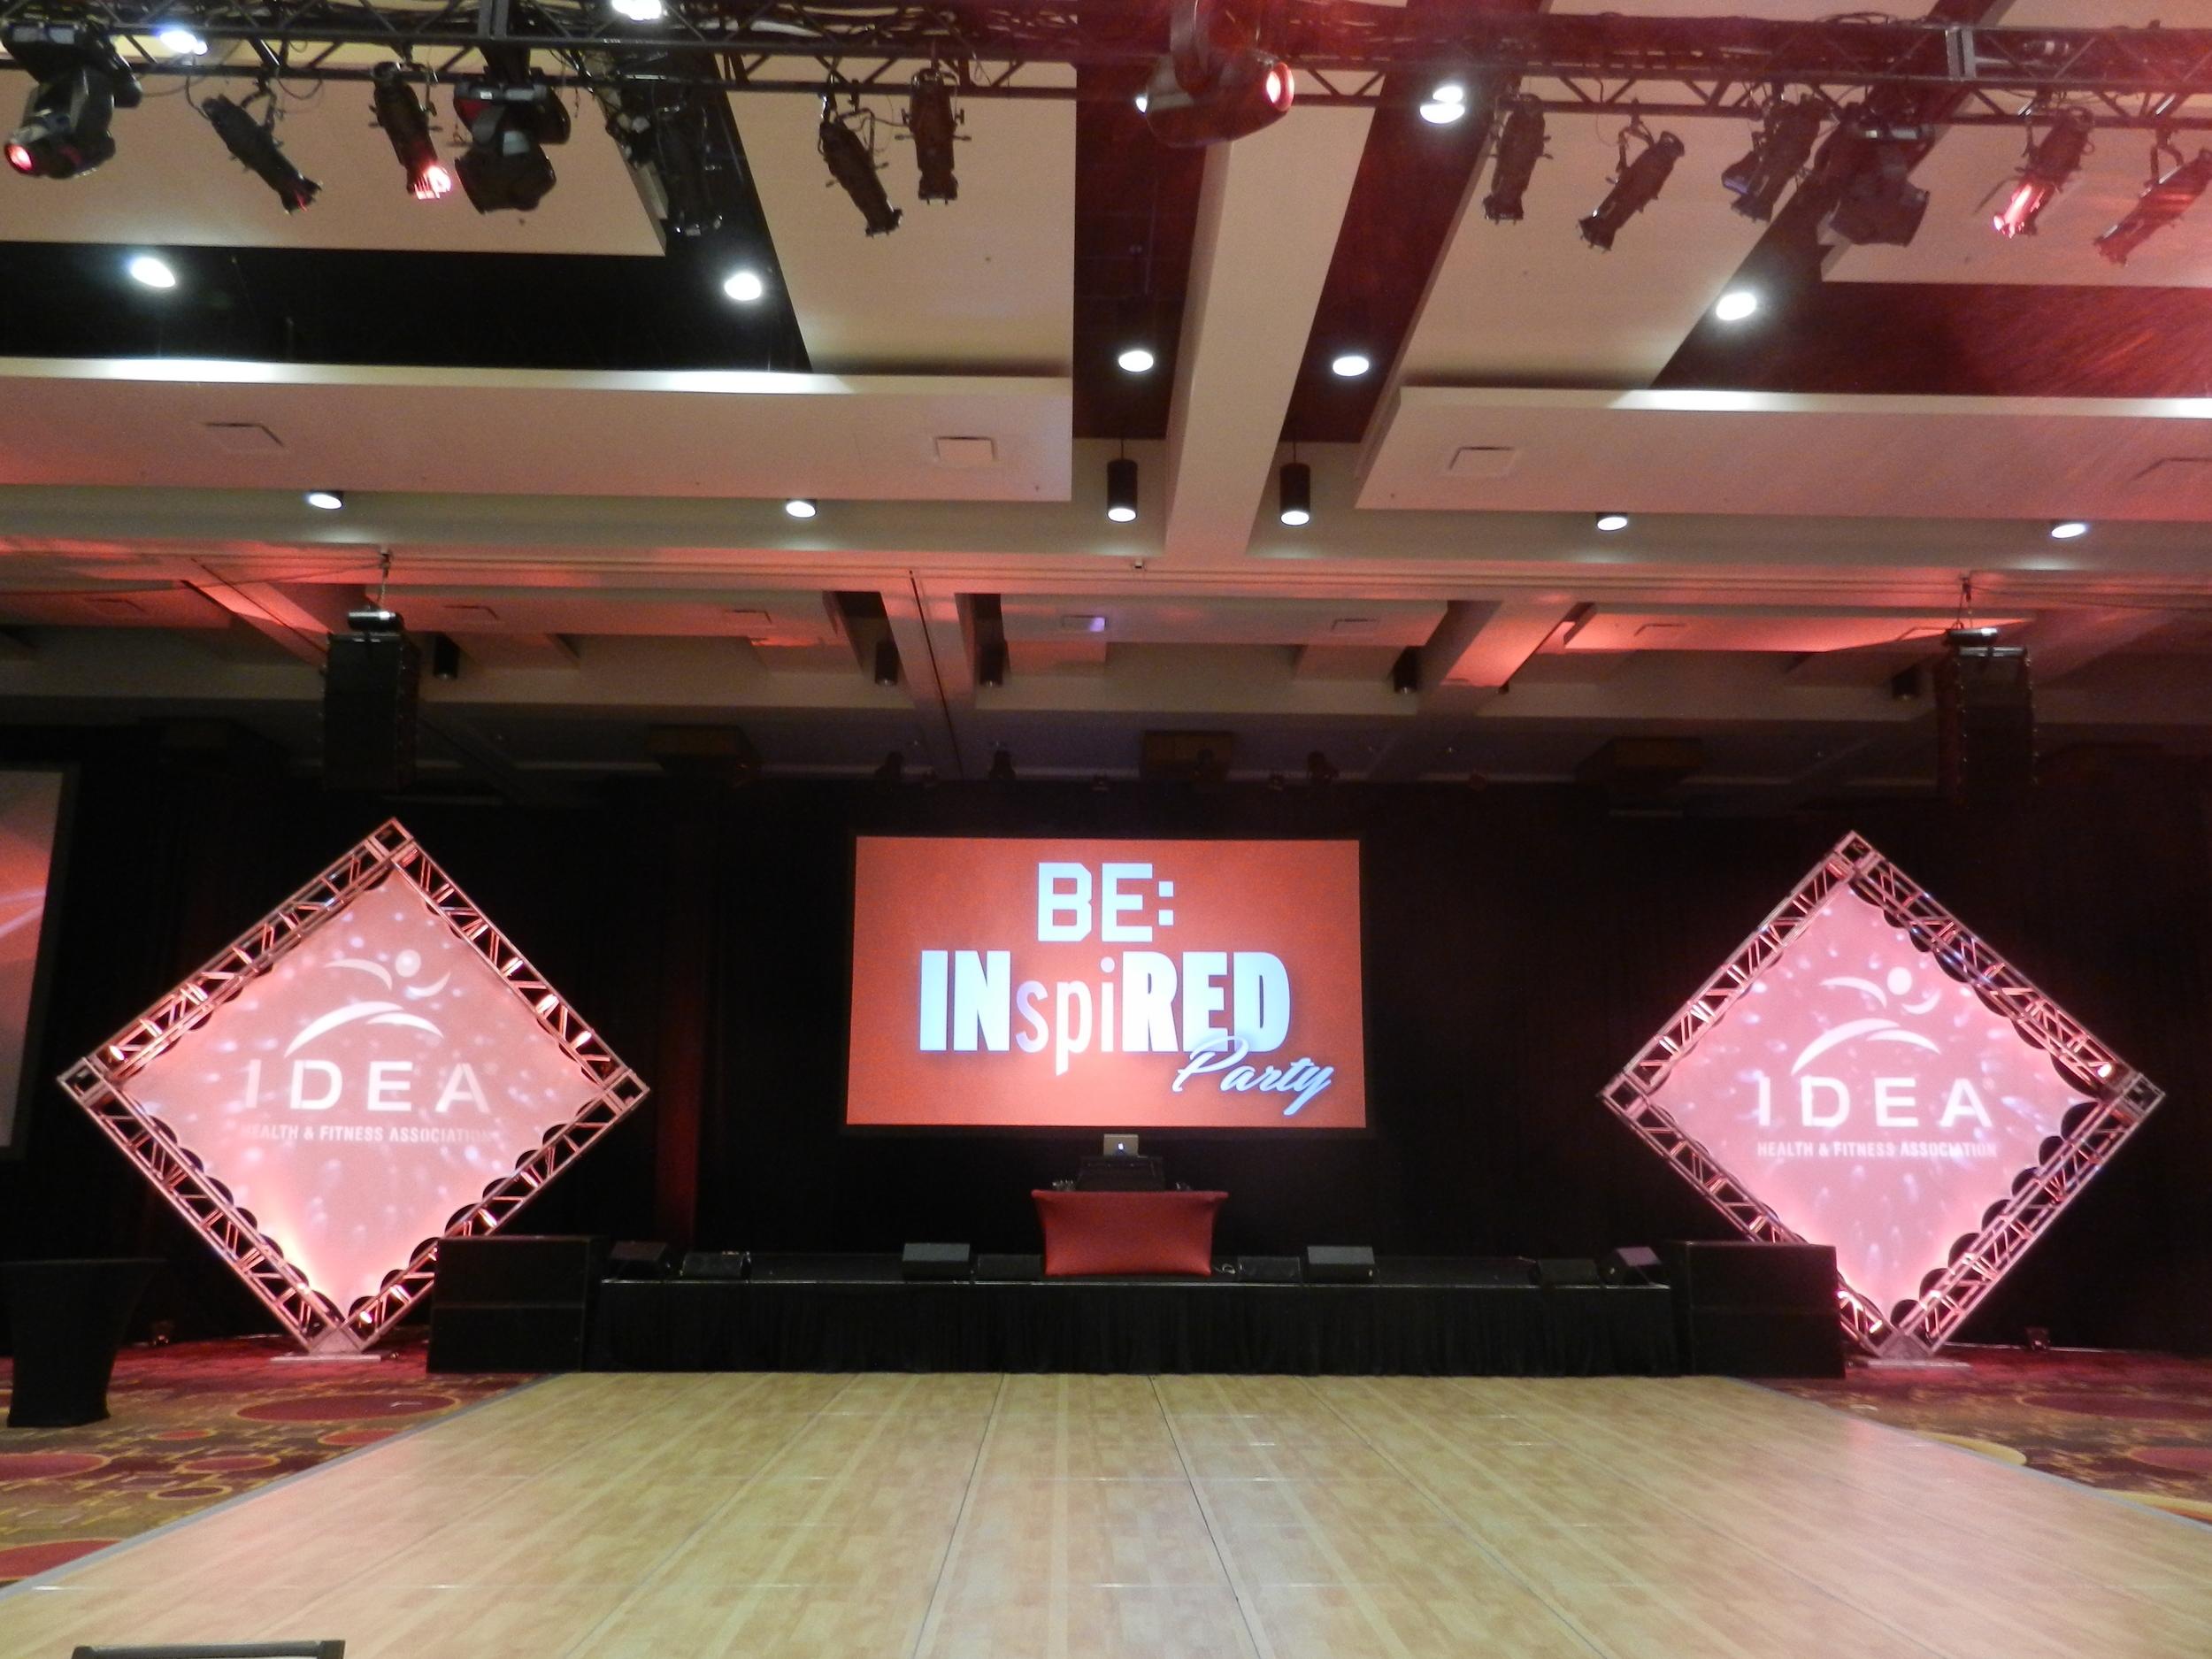 Corporate Event - Idea World Fitness Convention - dance floor